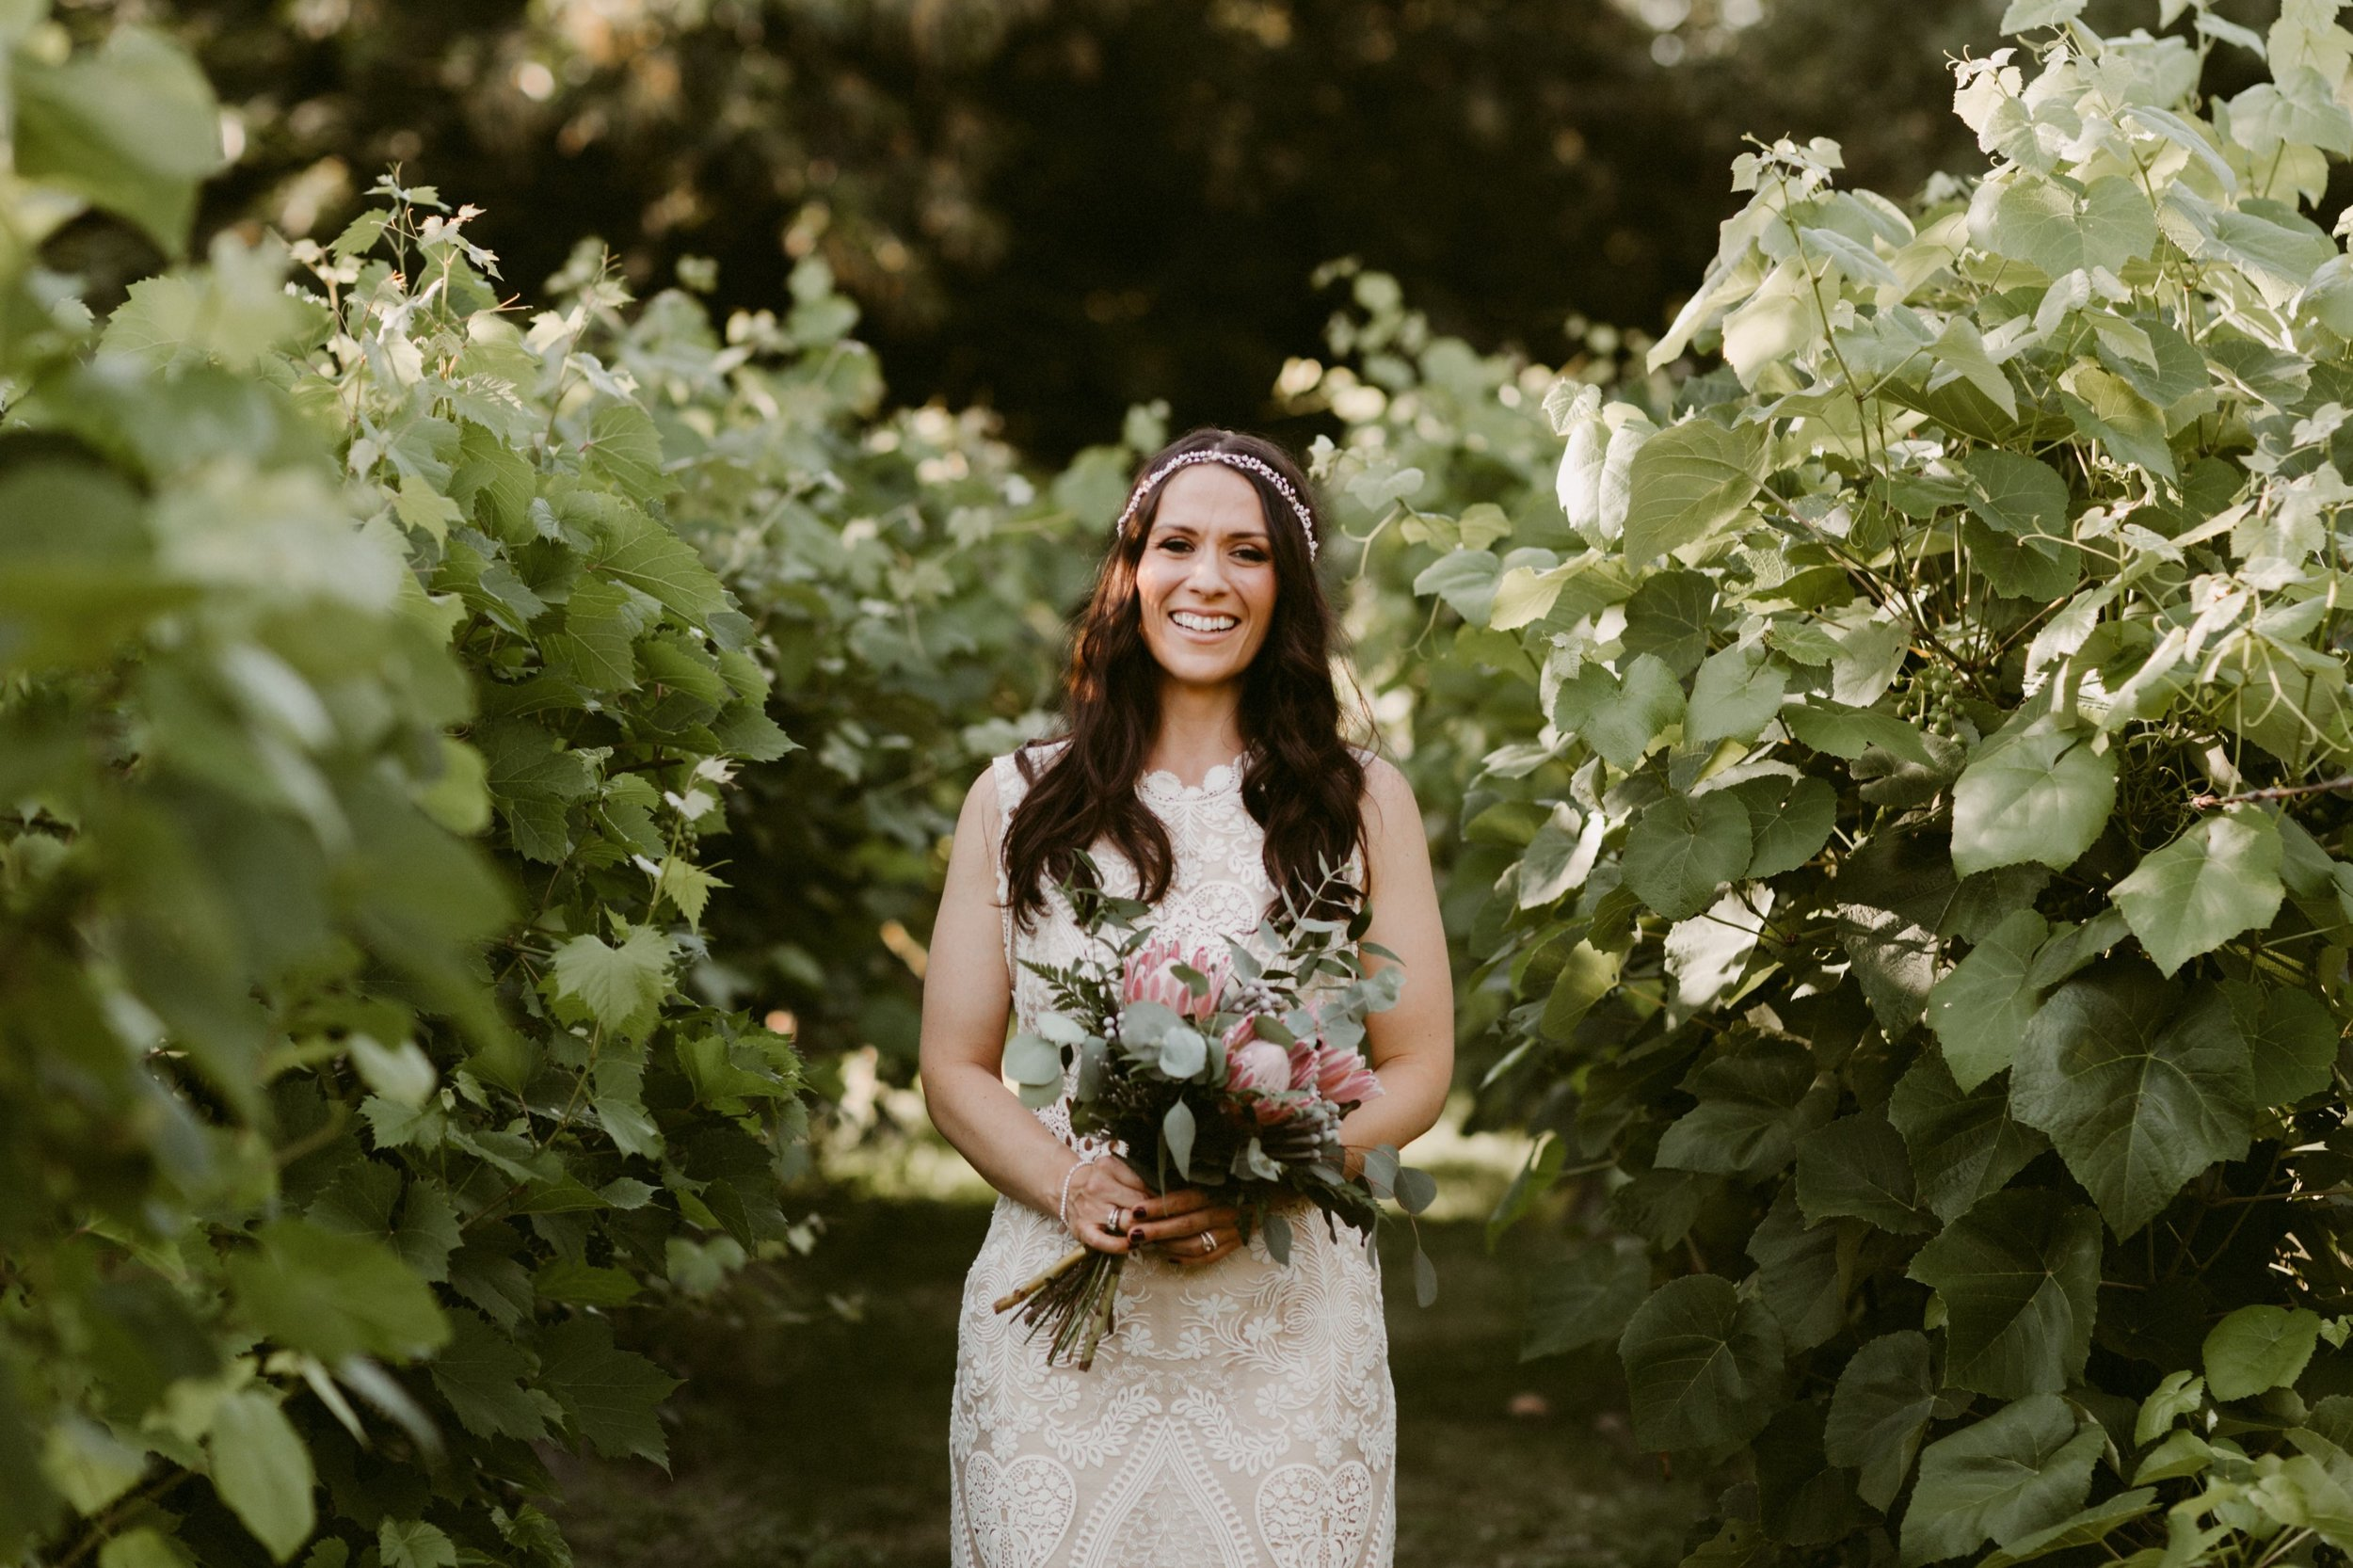 047_Spadina House Wedding (339 of 748)_House_Spadina_intimate_Toronto_Wedding.jpg